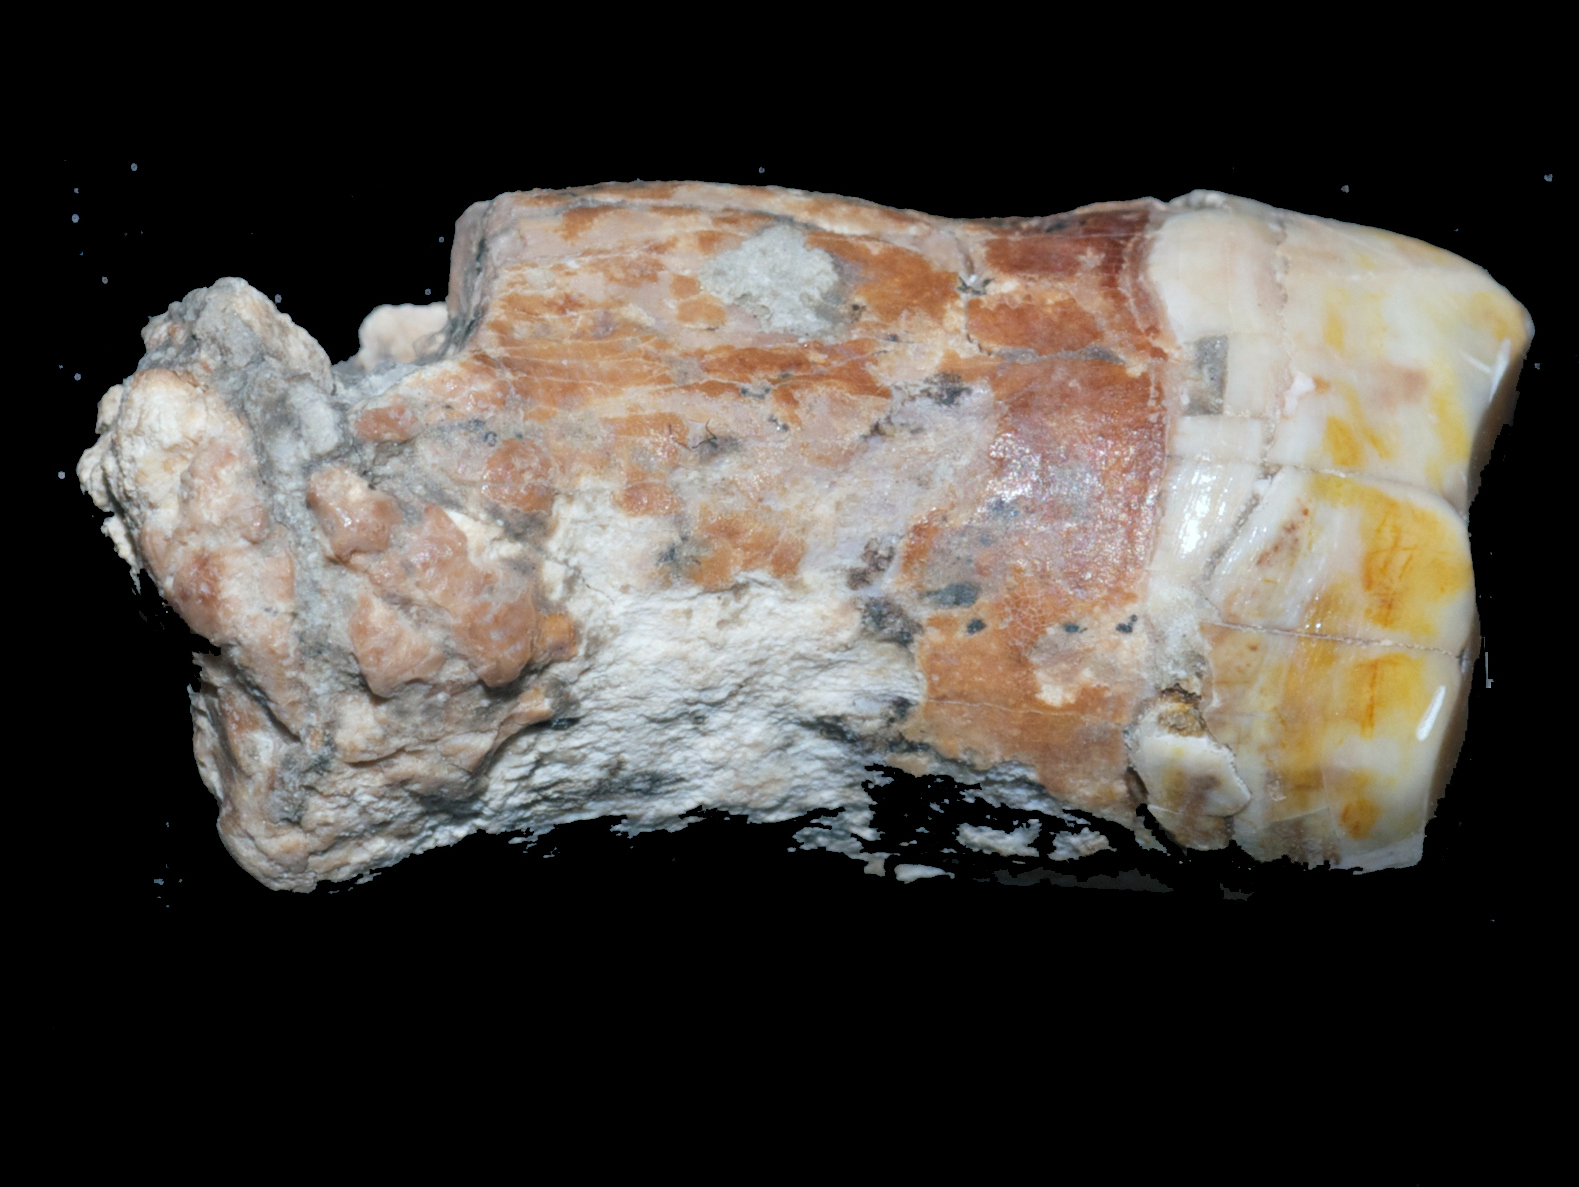 Molar from Ein Qashish, which prehistorians claim belonged to a Neanderthal